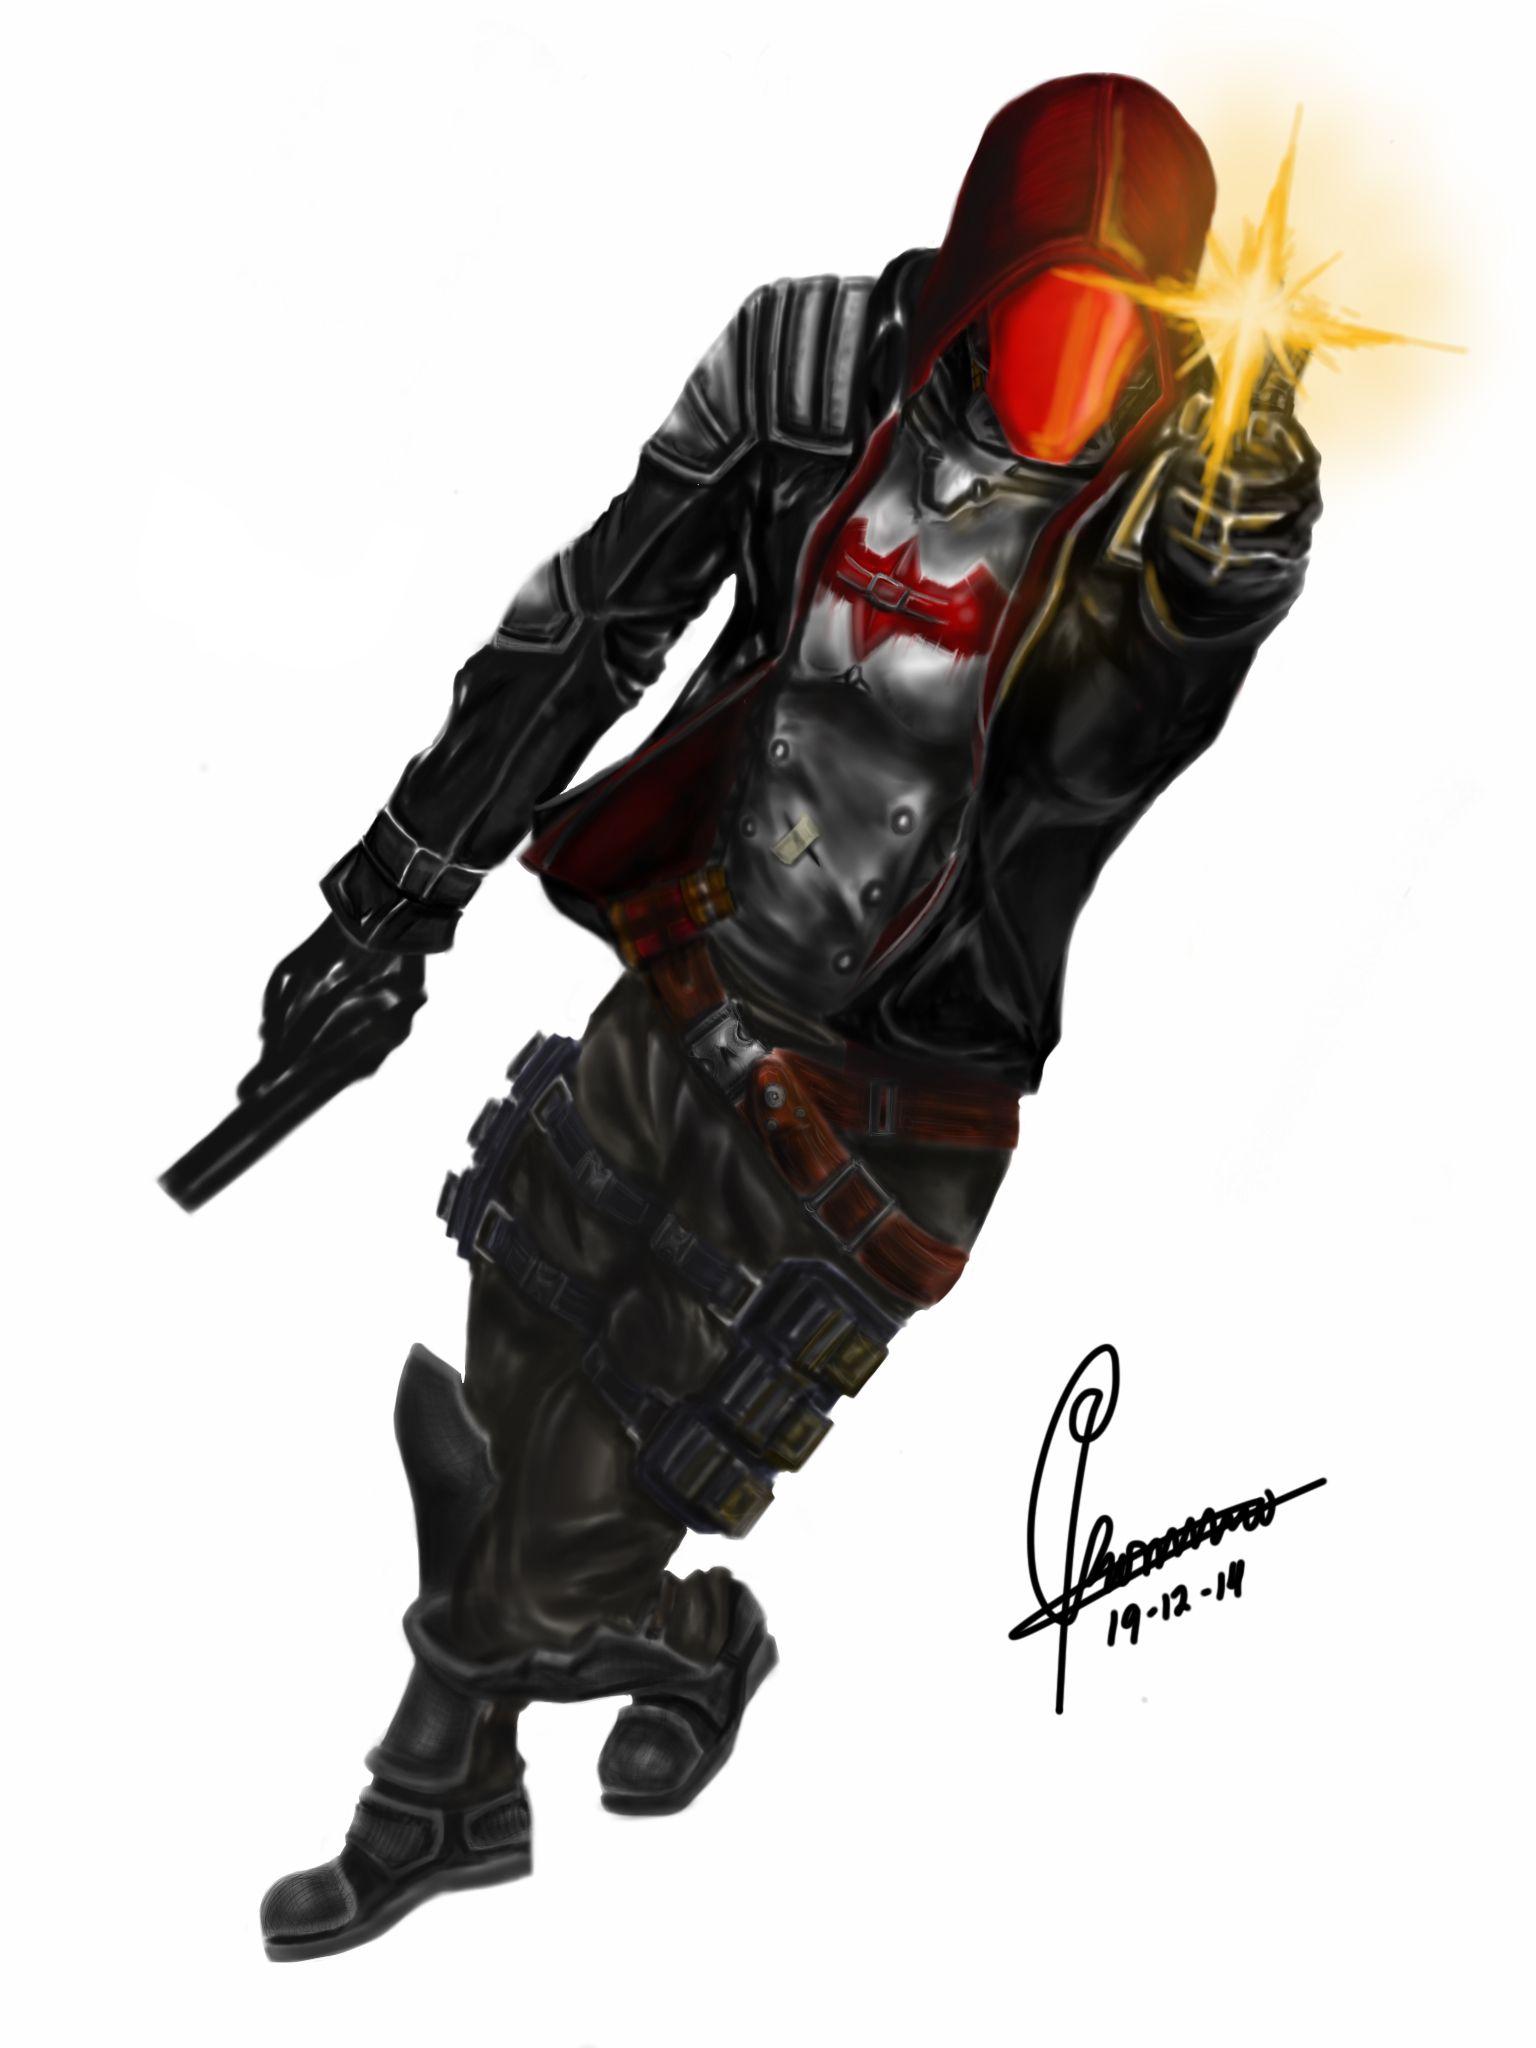 batman_arkham_knight___red_hood_by_giraerdo-d8d2t3r.jpg (1536×2048)